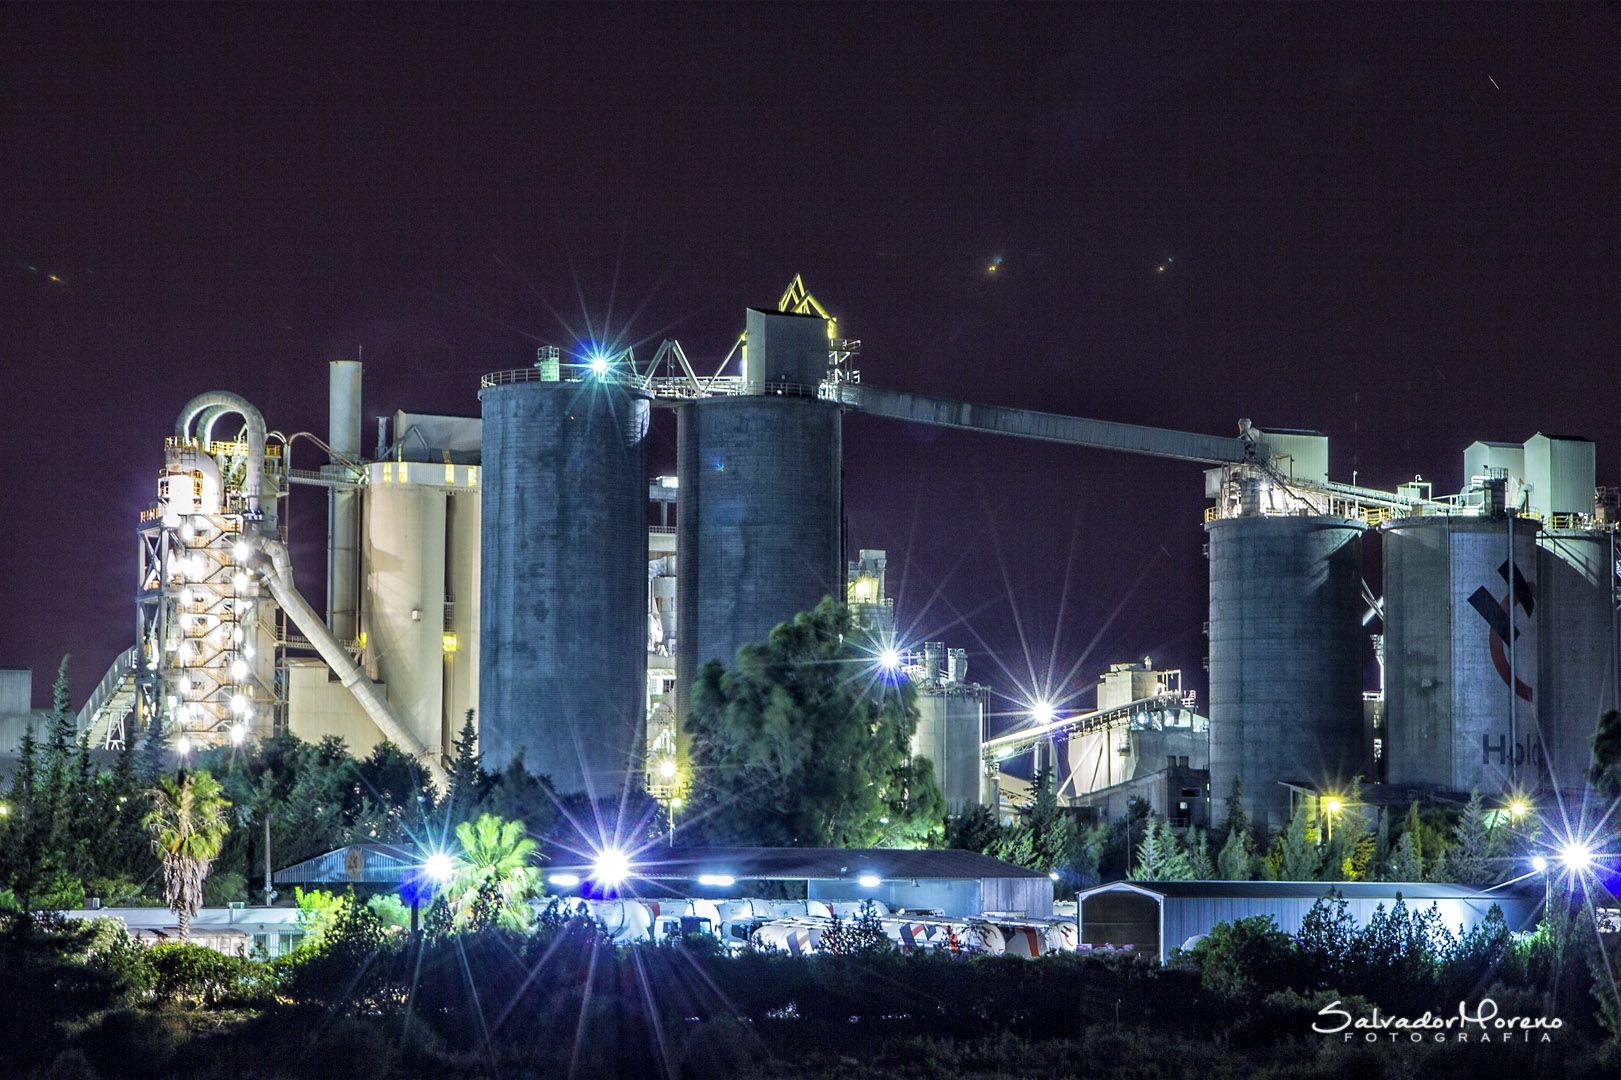 Fábrica. Foto: Salvador Moreno #photo  #Nocturna